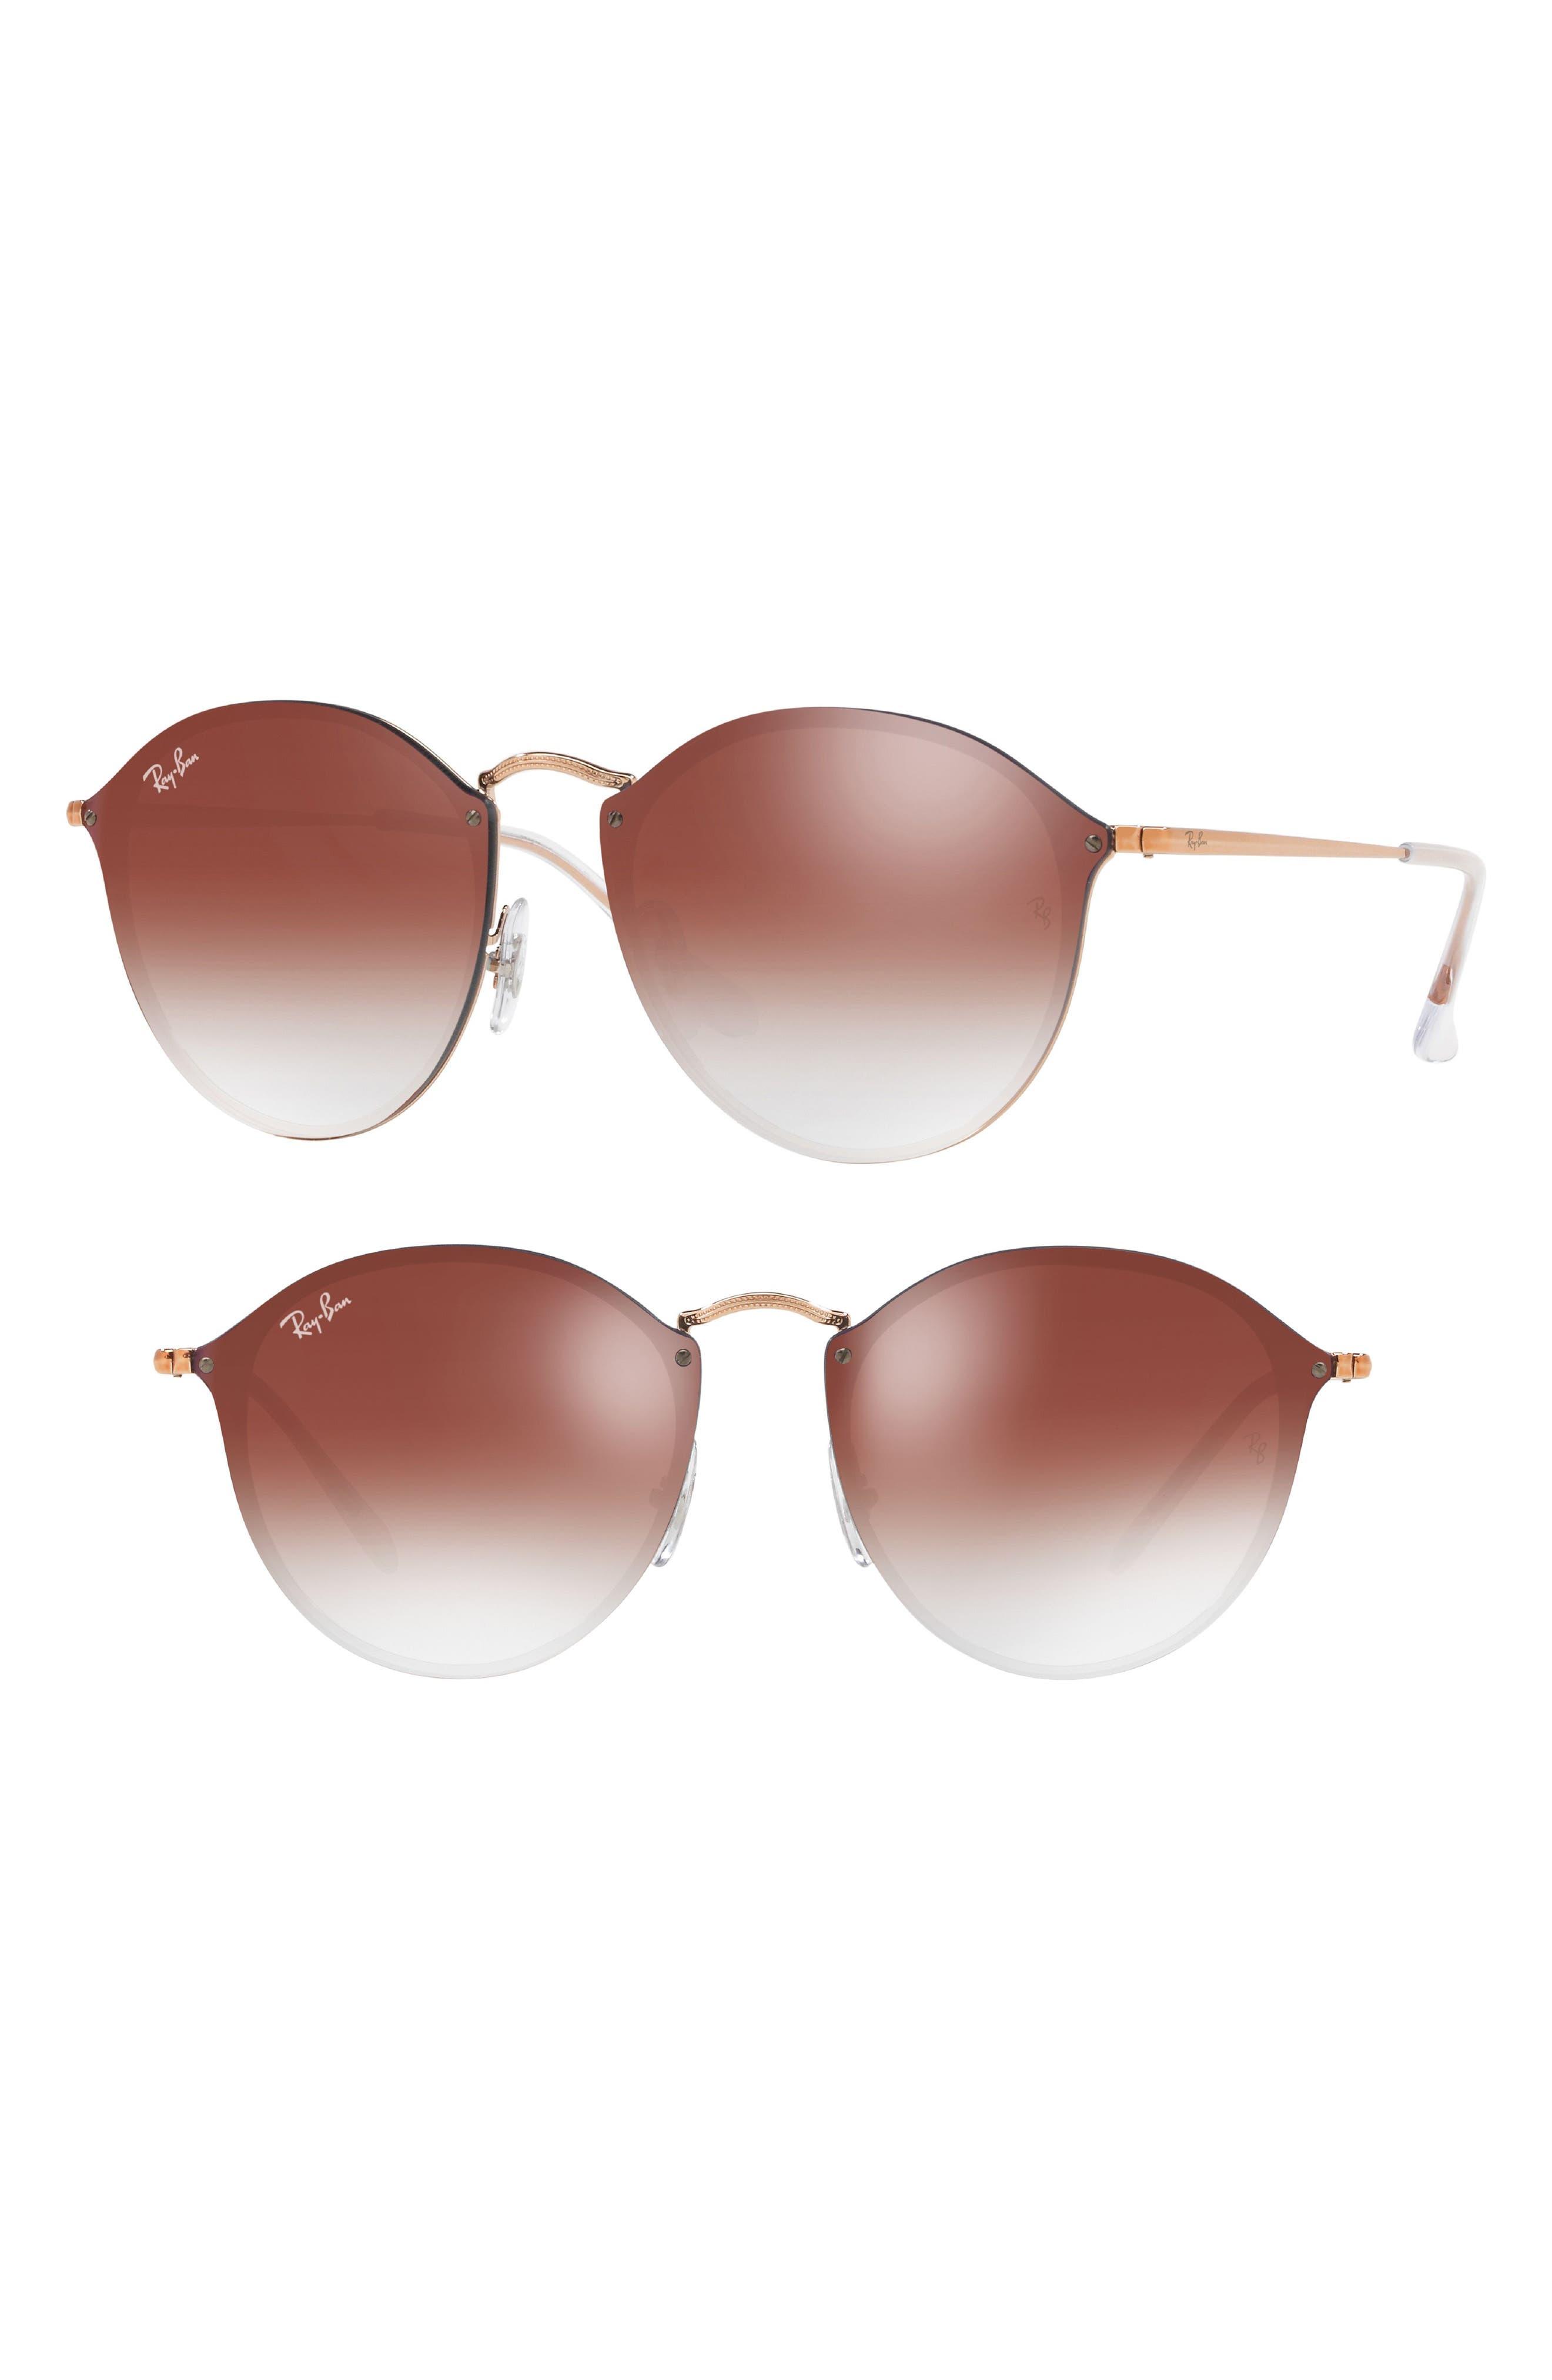 Blaze 59mm Round Mirrored Sunglasses,                             Main thumbnail 1, color,                             221